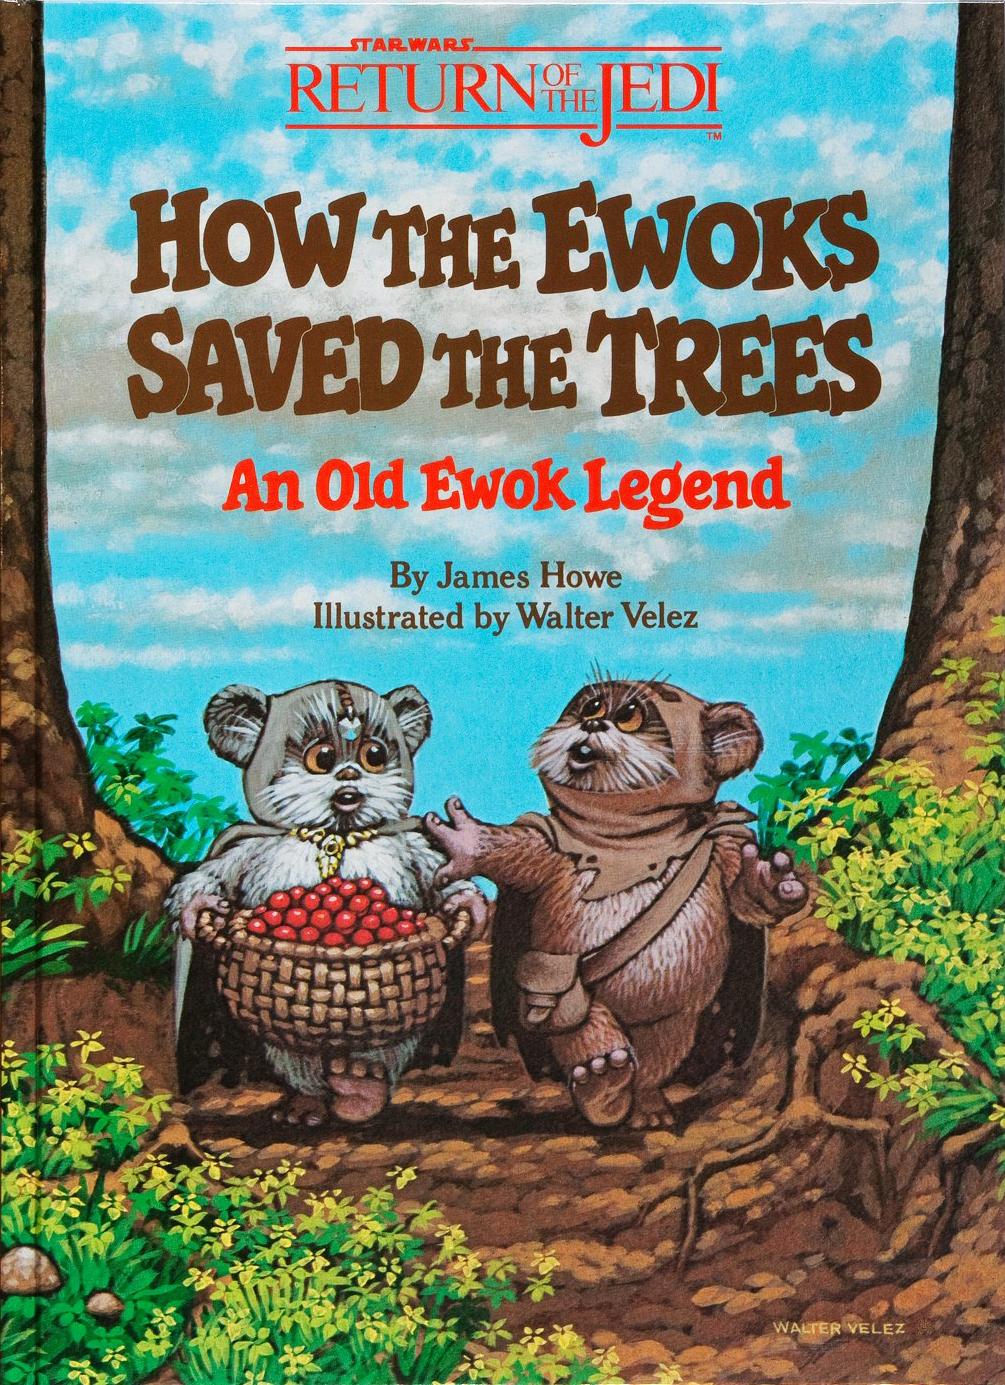 File:HowEwokssavedtrees.jpg